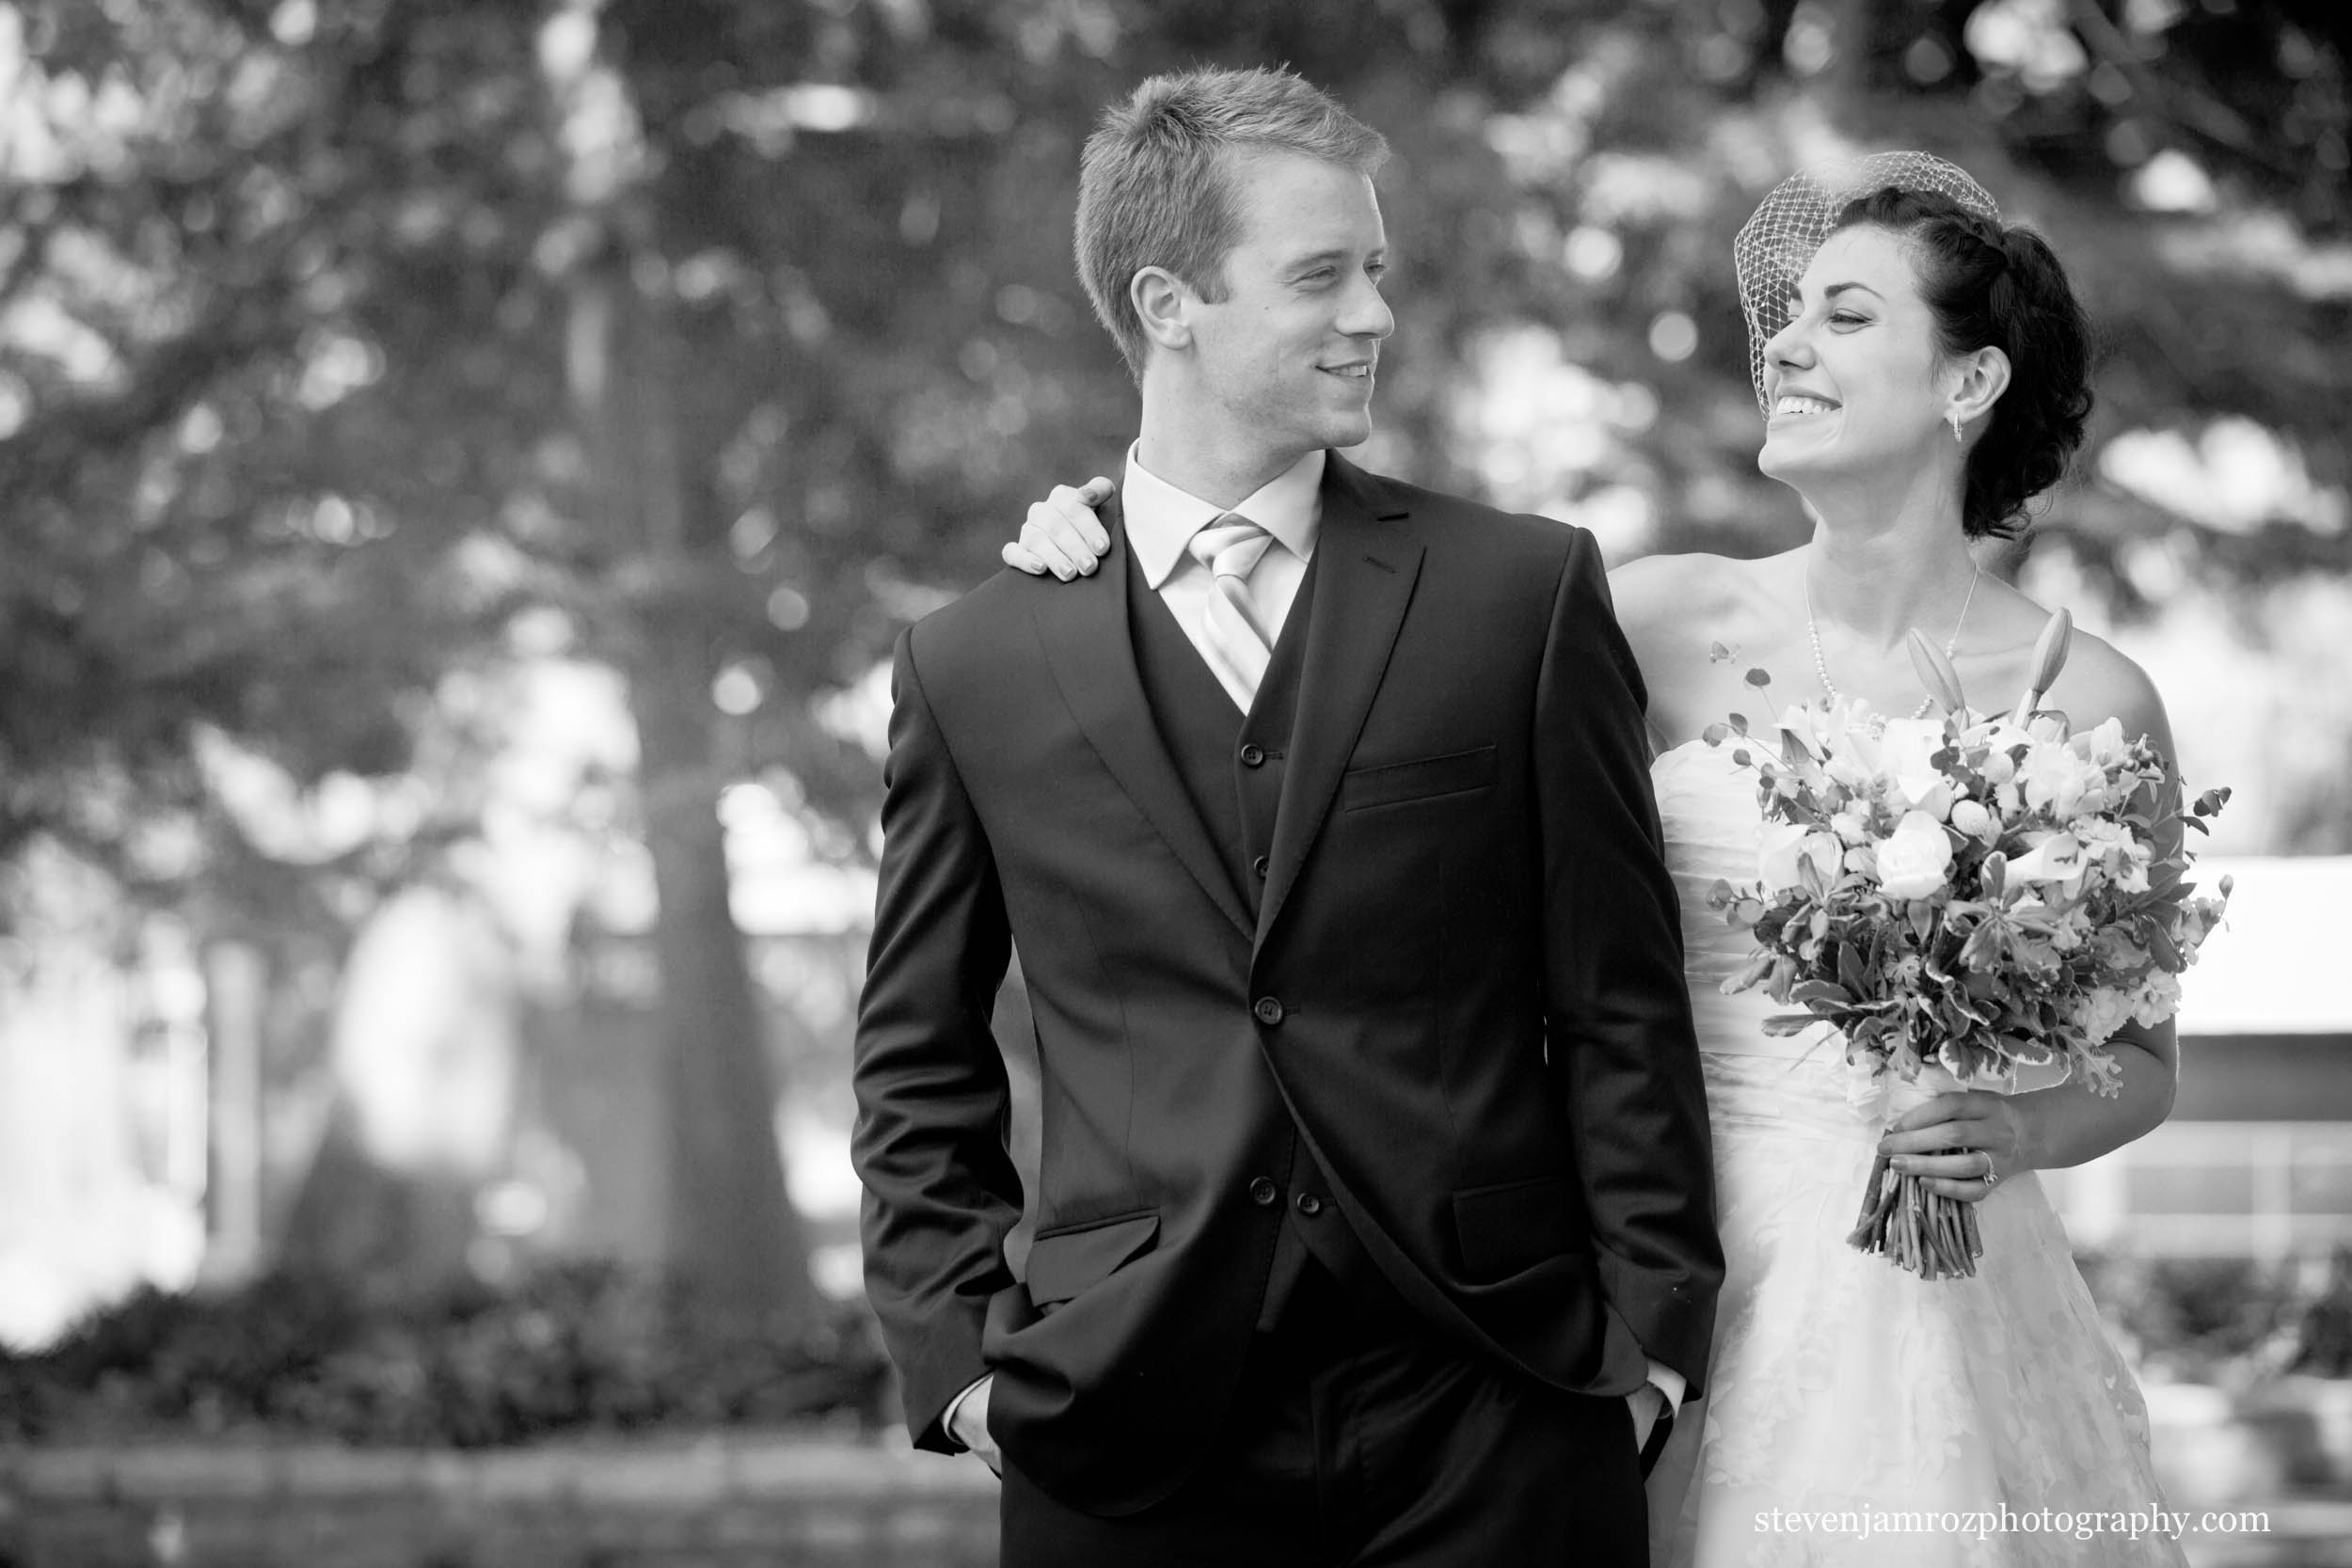 portrait-bride-groom-moore-square-raleigh-steven-jamroz-photography-0242.jpg